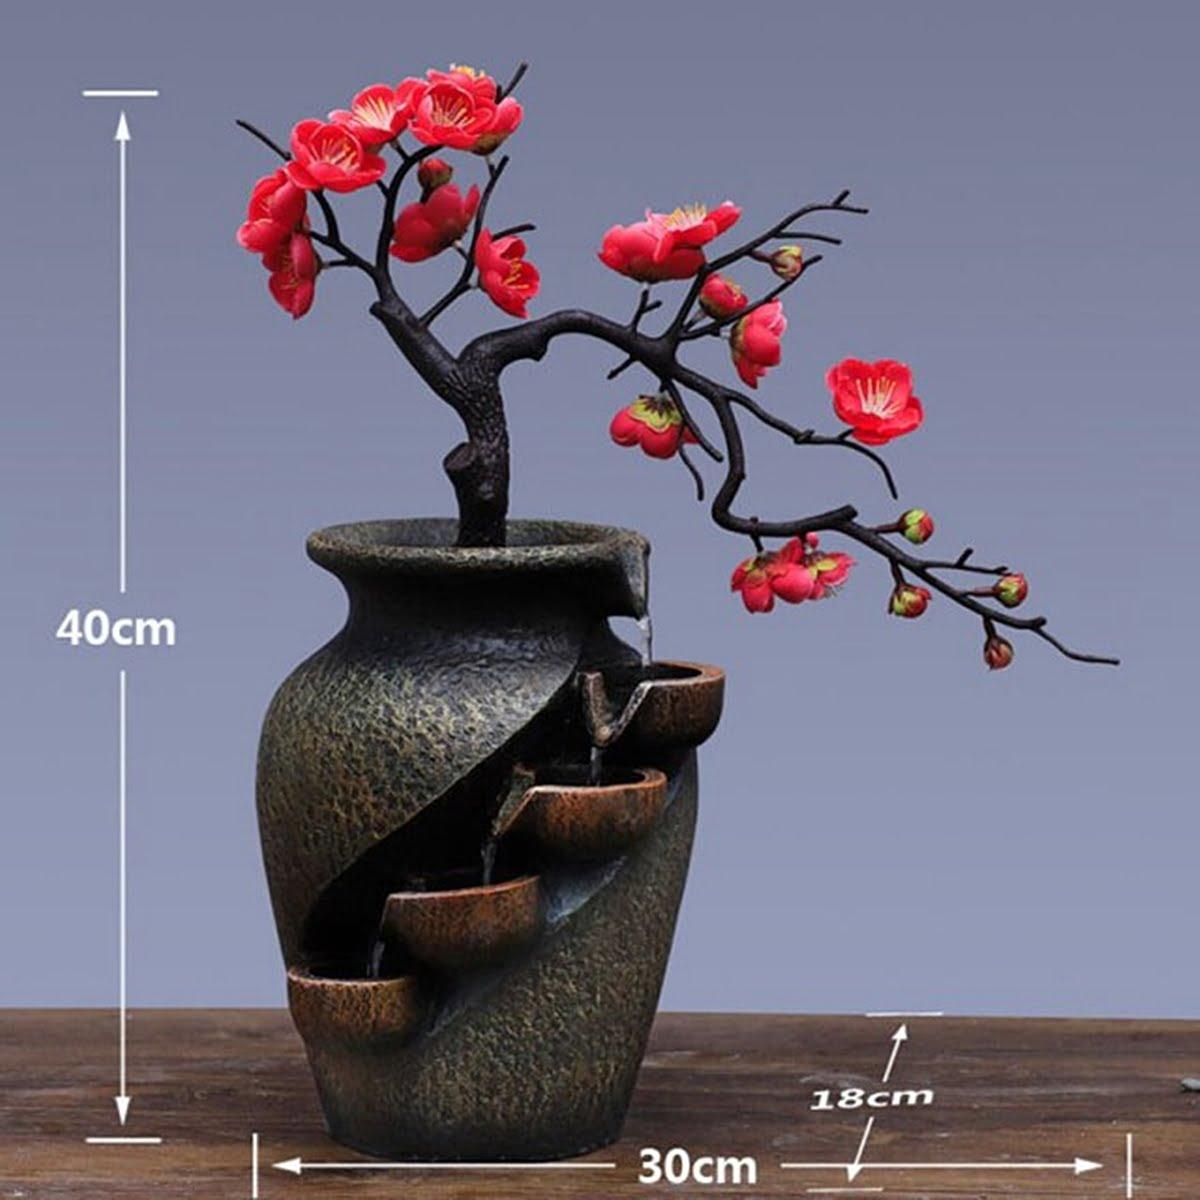 Fantana arteziana de interior, tip vaza cascada, 40 cm, Magrot 052 feng shui